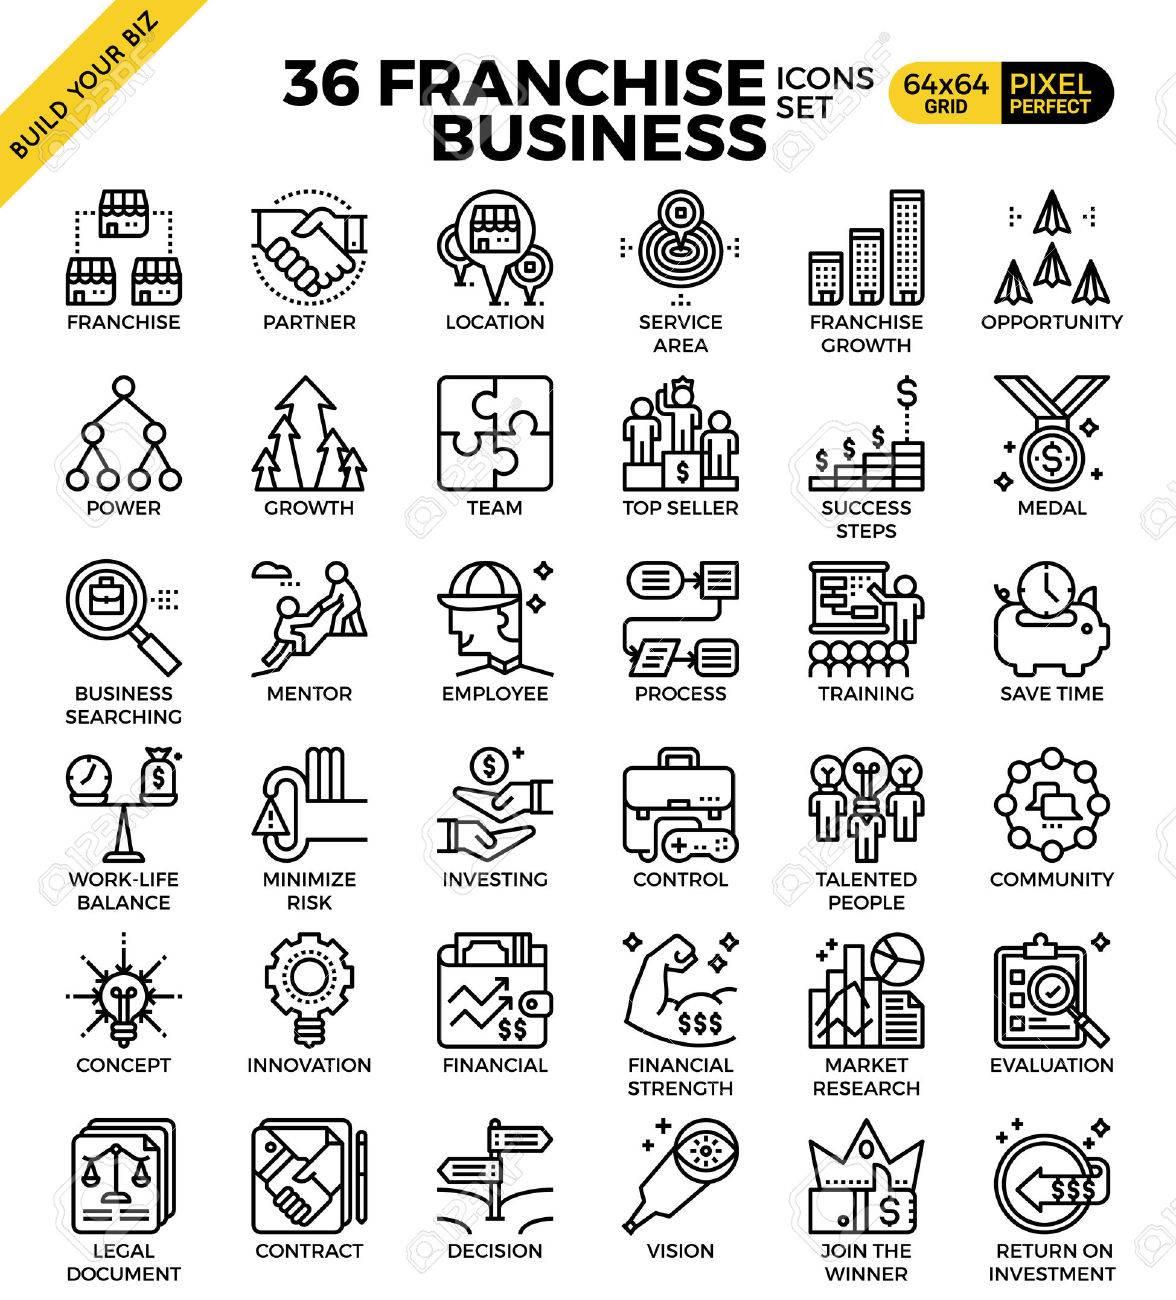 Franchise business outline icons modern style for website or print illustration - 63576667